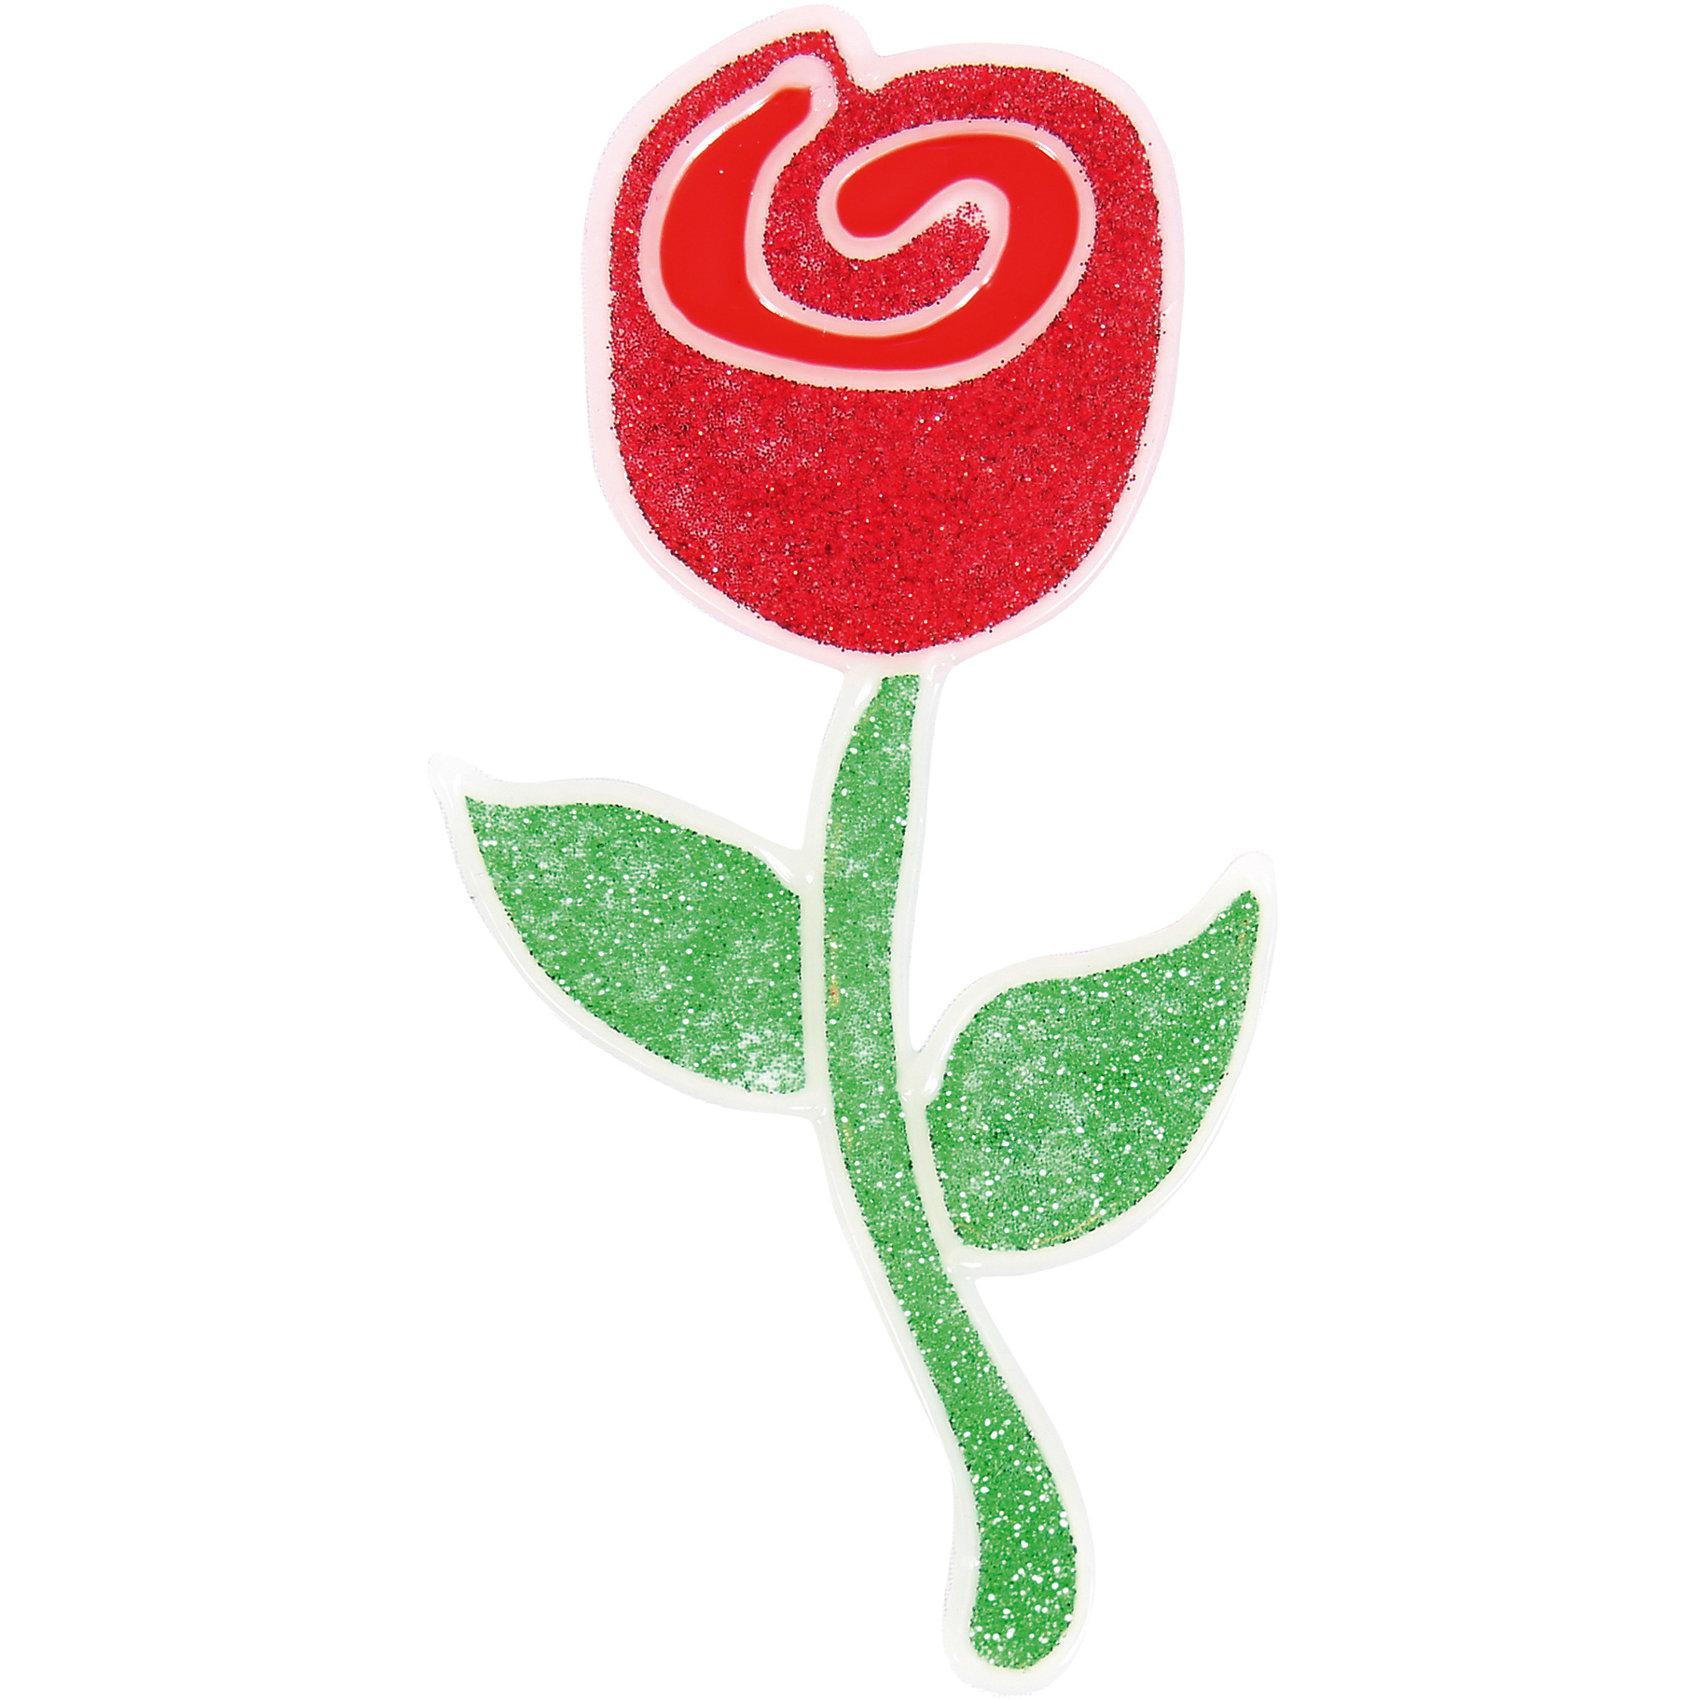 Волшебная Страна Наклейка на окно Роза наклейка ваш подвиг